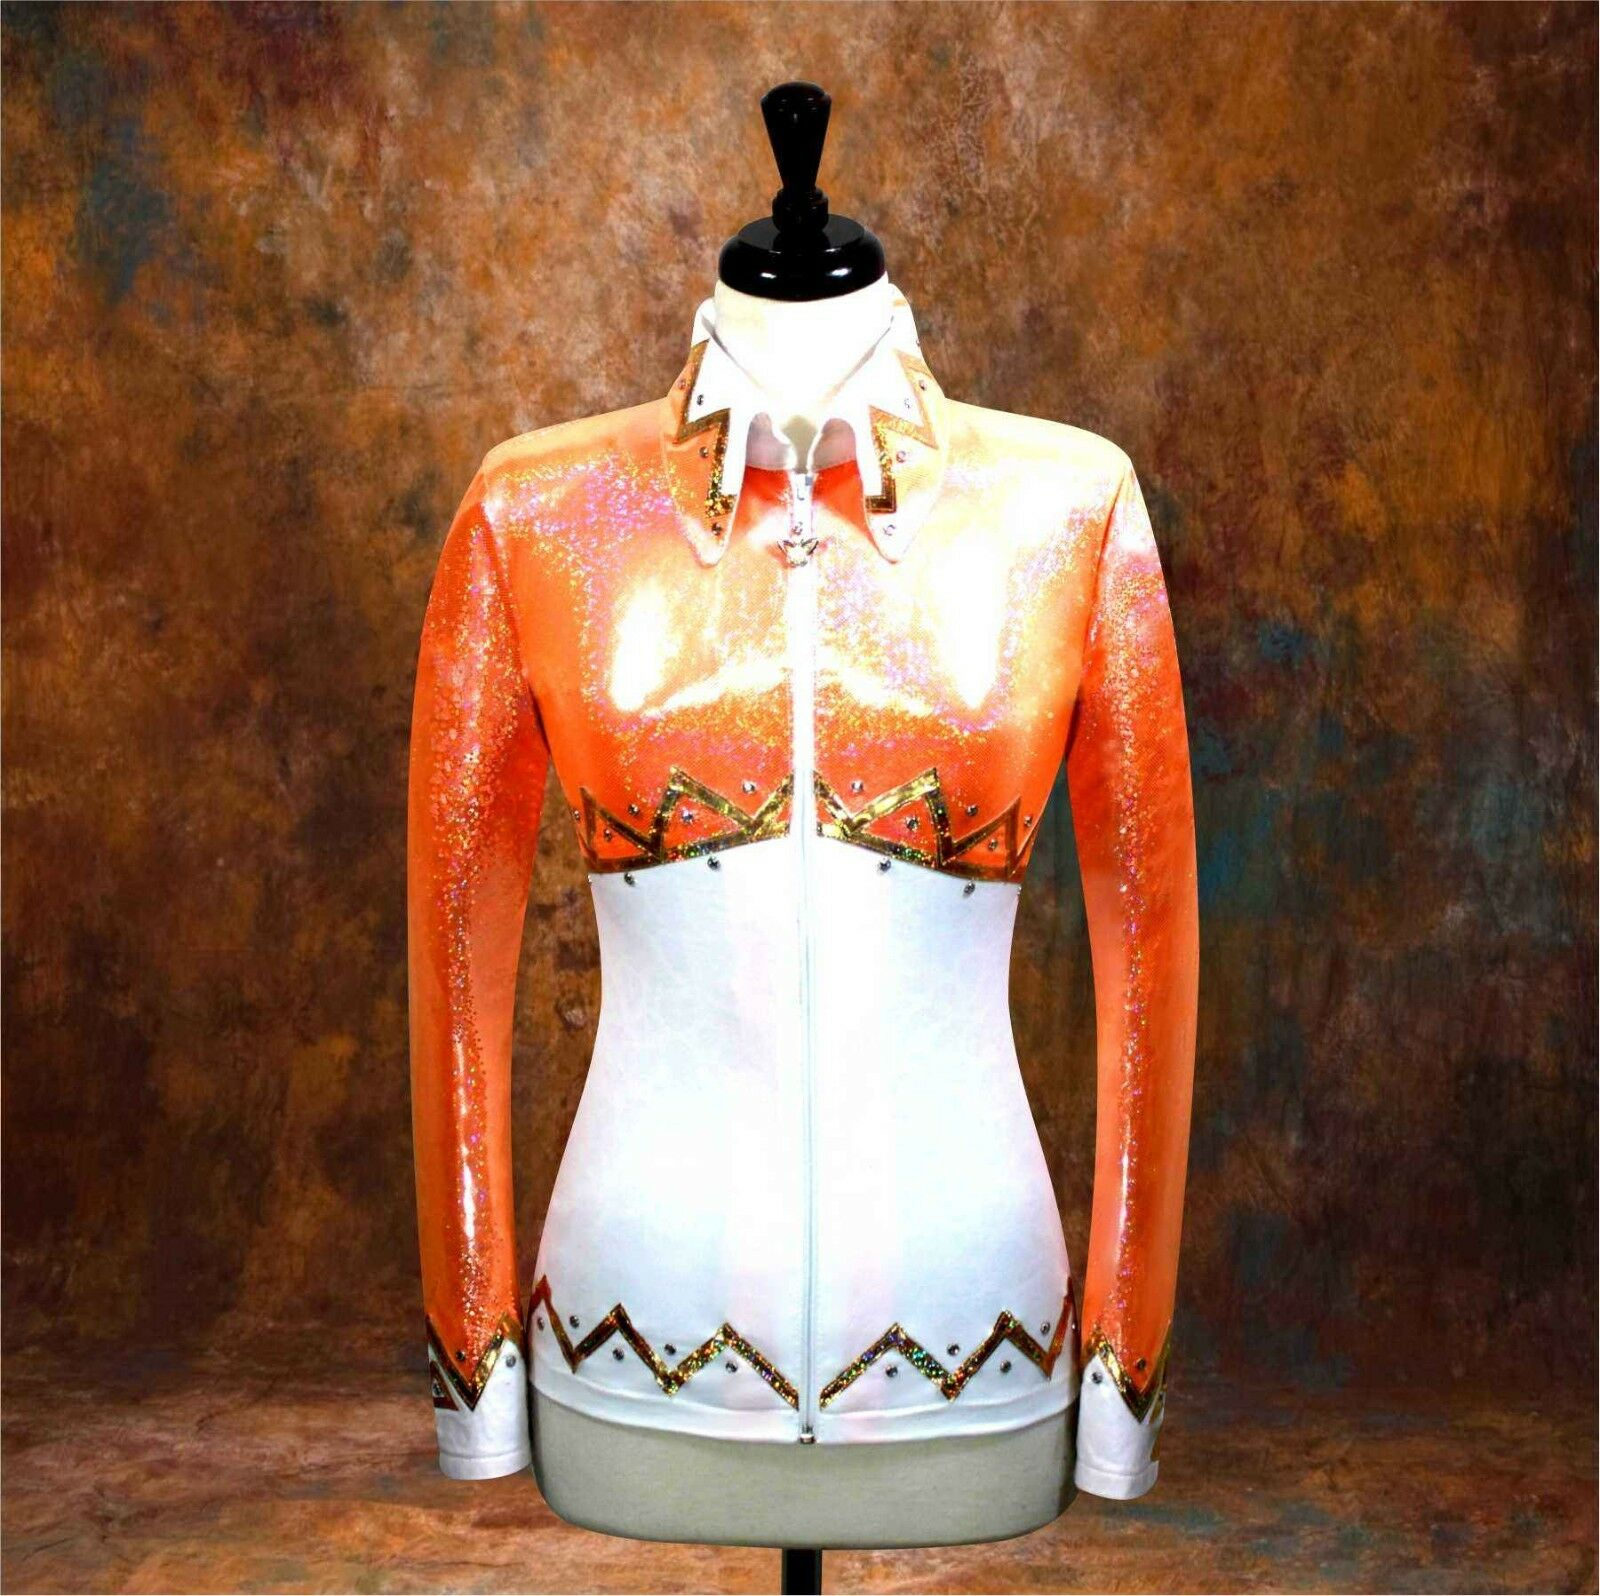 3X-Grande  teatralidad placer Equitación Chaqueta Camisa Camisa Camisa Rodeo ferrocarril oeste de Show afb105